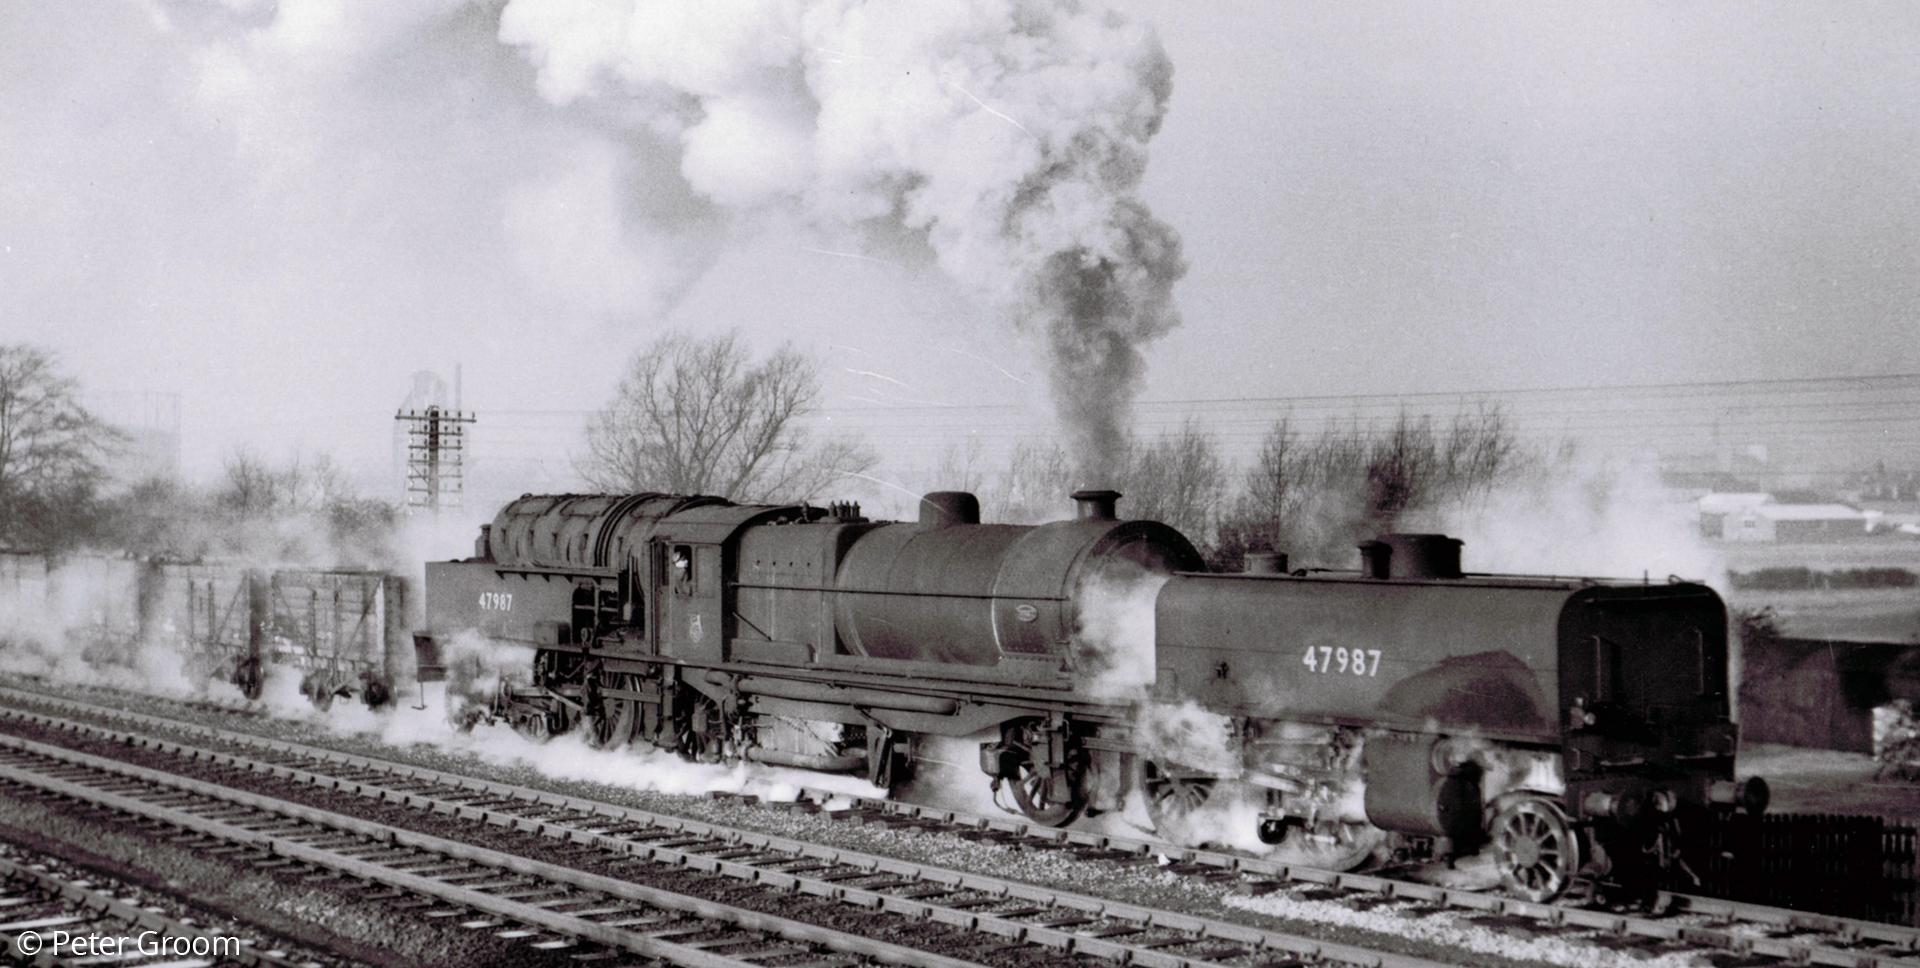 LMS Beyer Garratt 47987 at Melton Mowbray in December 1954. © Peter Groom